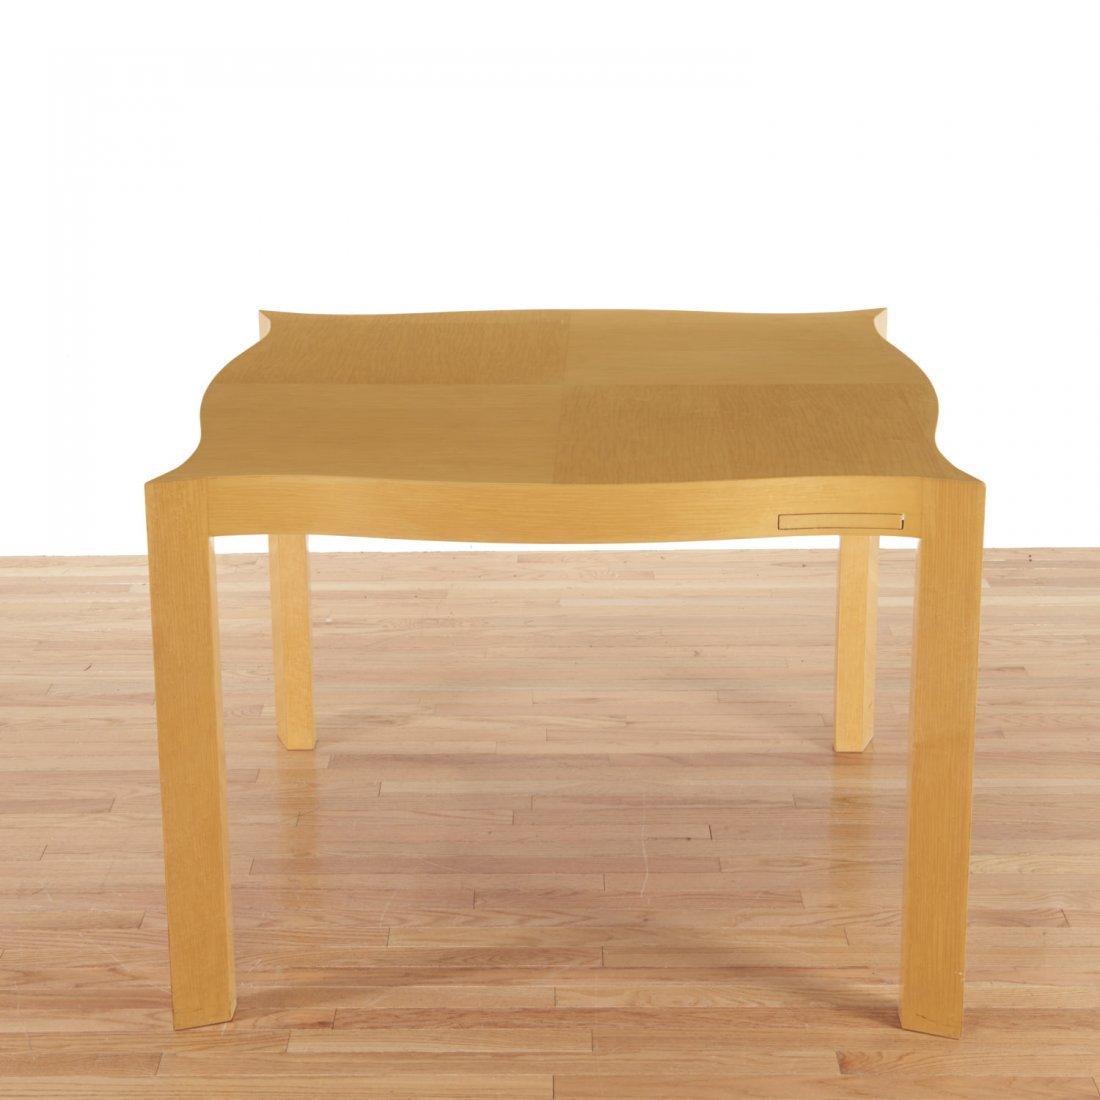 Designer shaped blonde wood bridge table - 2